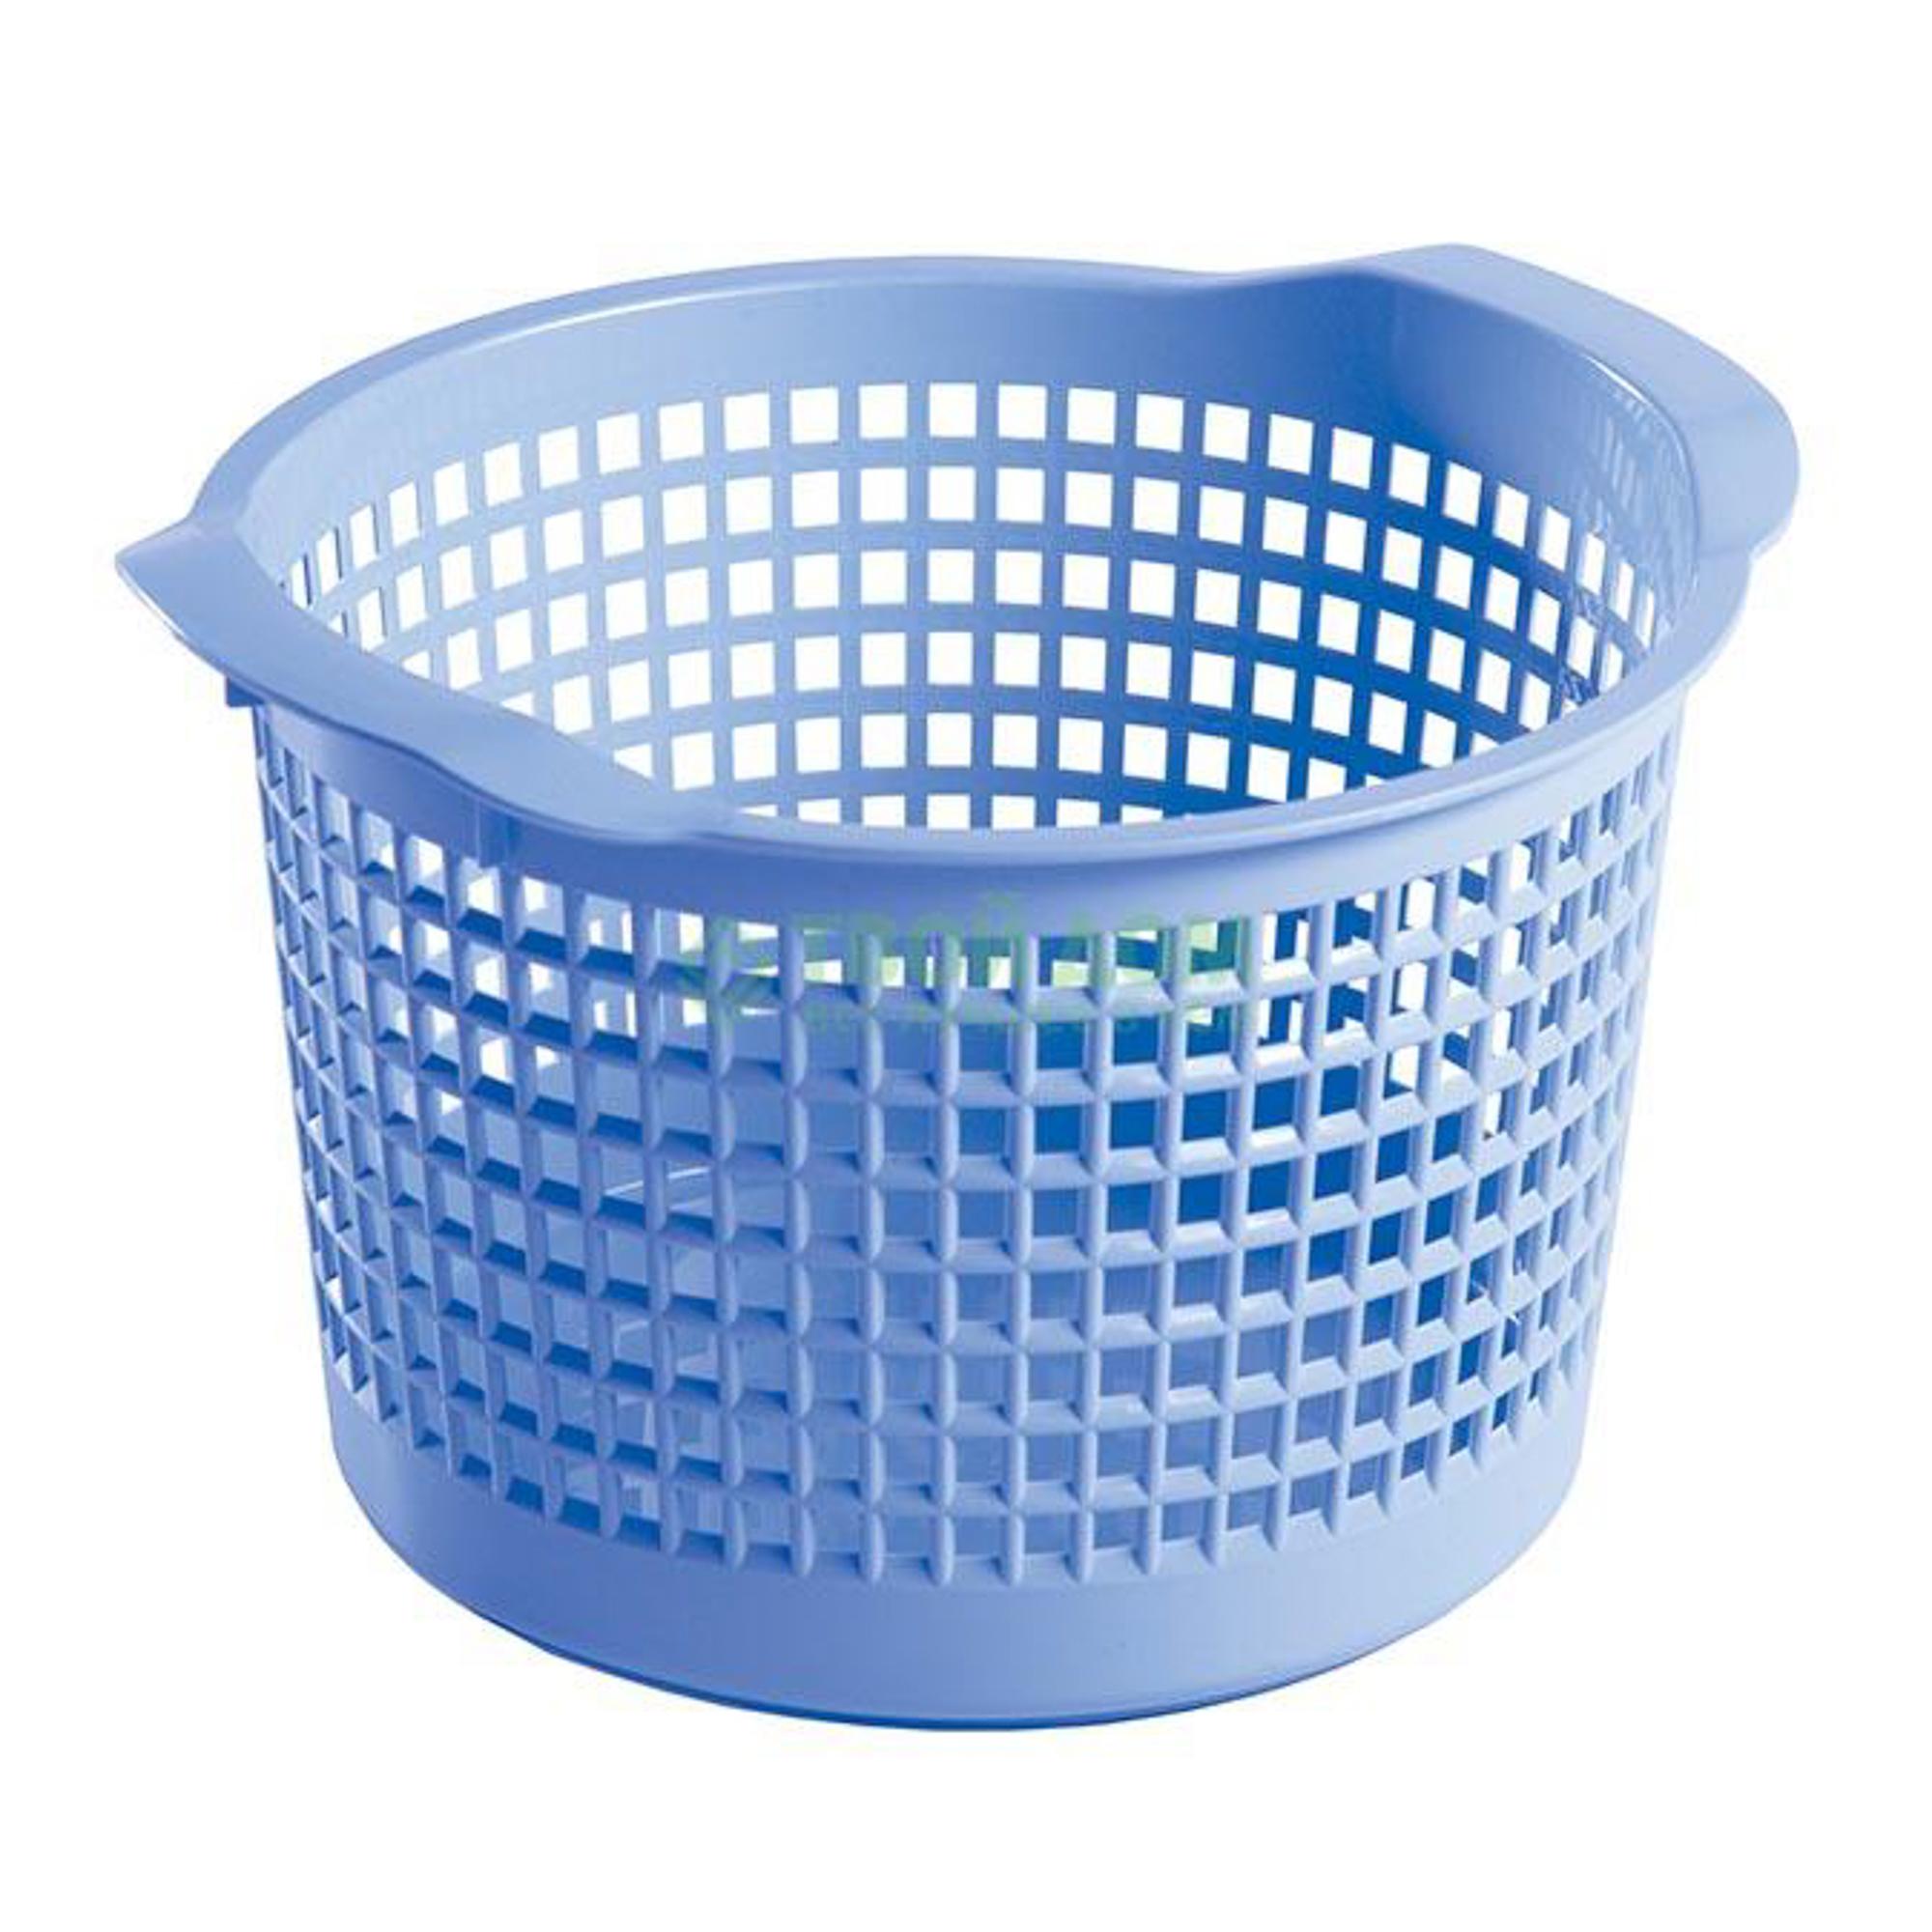 корзина для мусора бытпласт 10л диаметр 256 мм высота 280 мм Корзина Бытпласт универсальная d187 h115 мм Голубой (4312242)